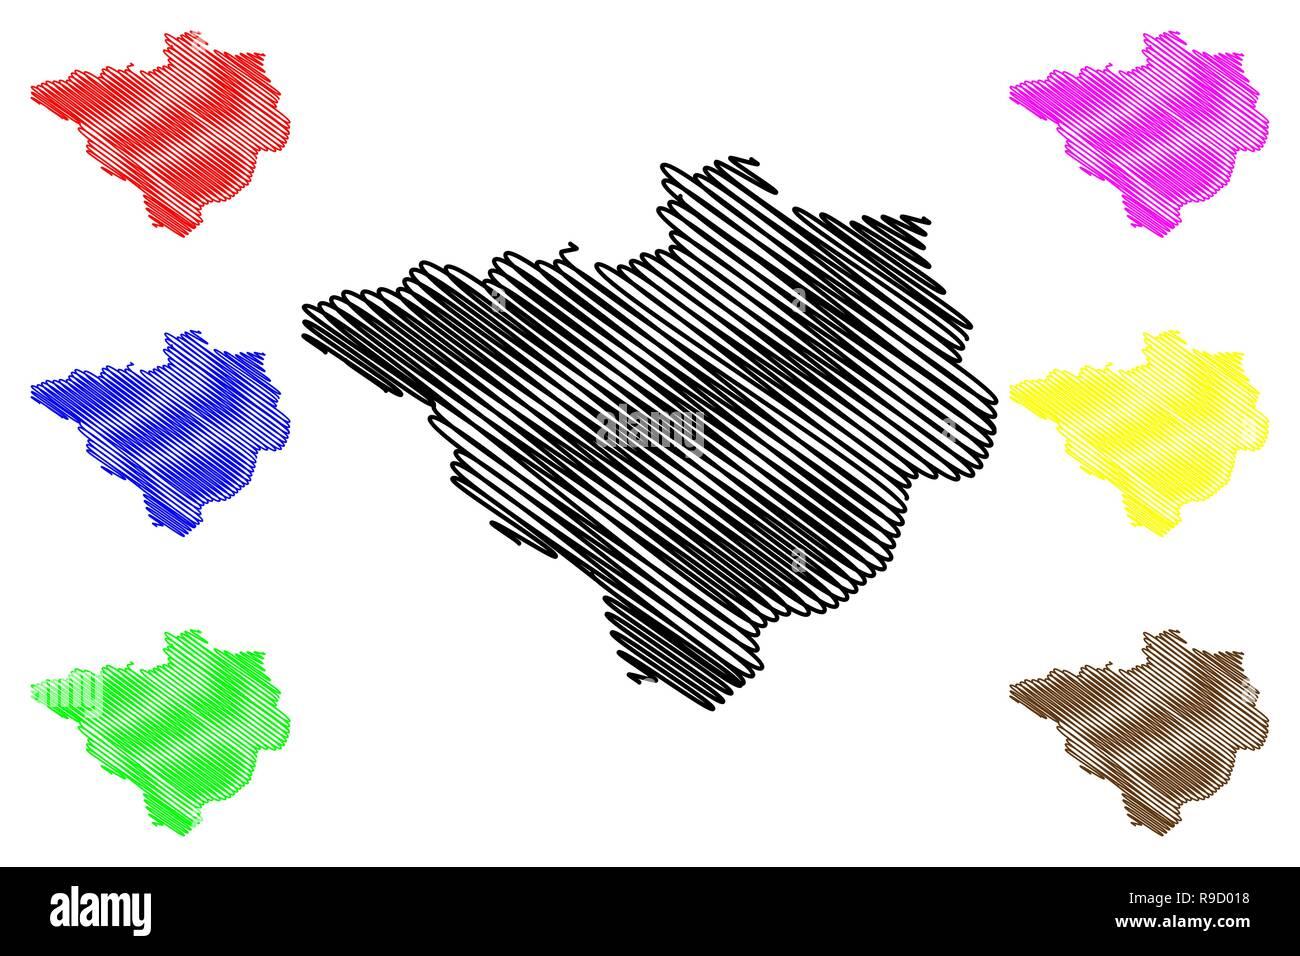 Yozgat (Provinces of the Republic of Turkey) map vector illustration, scribble sketch Yozgat ili map - Stock Image